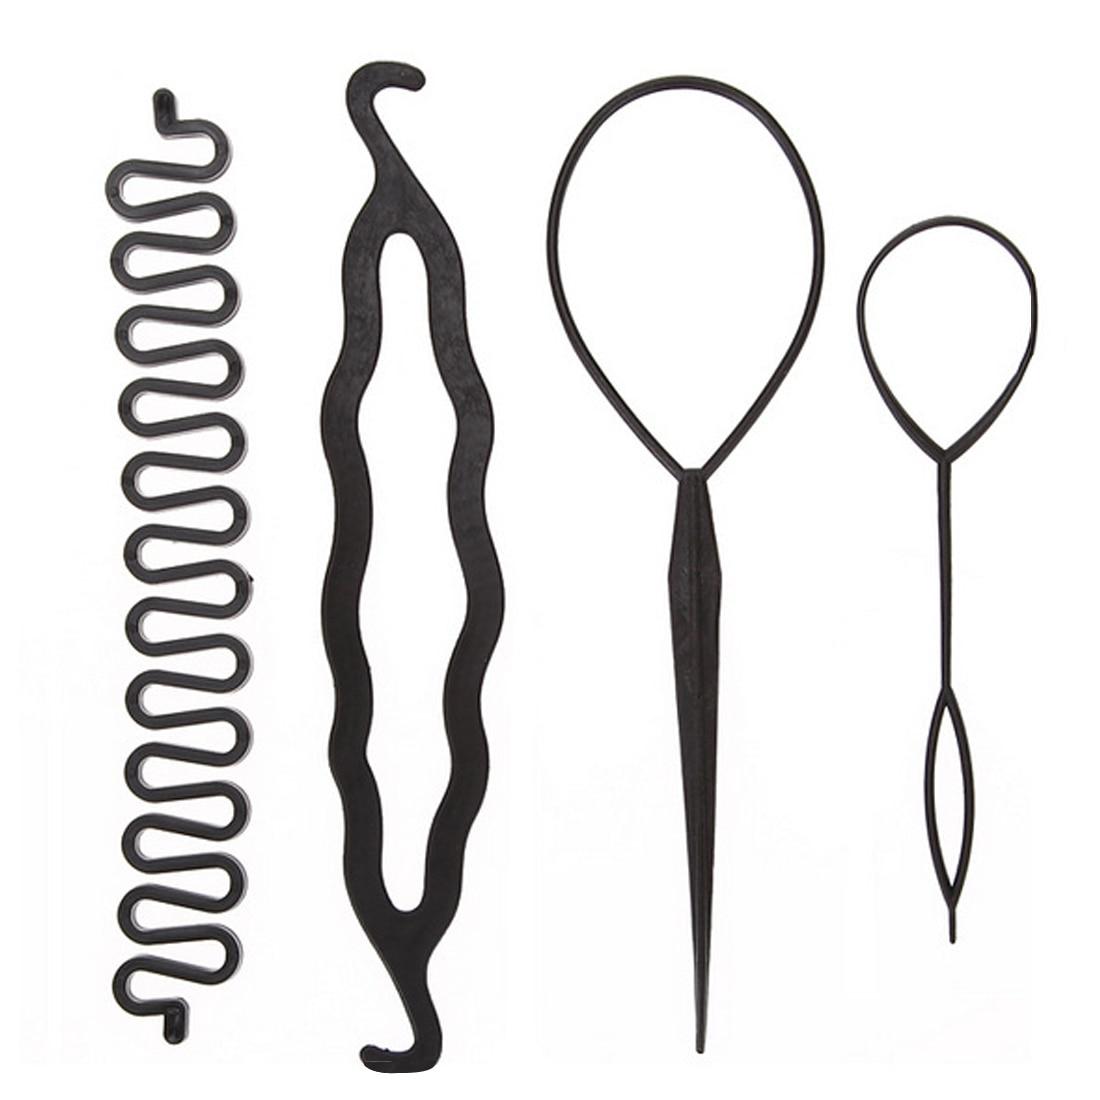 4pcs/set Magic Hair Braiding Twist Curler Styling Set Hairpin Holding Hair Braiders Pull Needle Ponytail DIY Hairdressing Tool